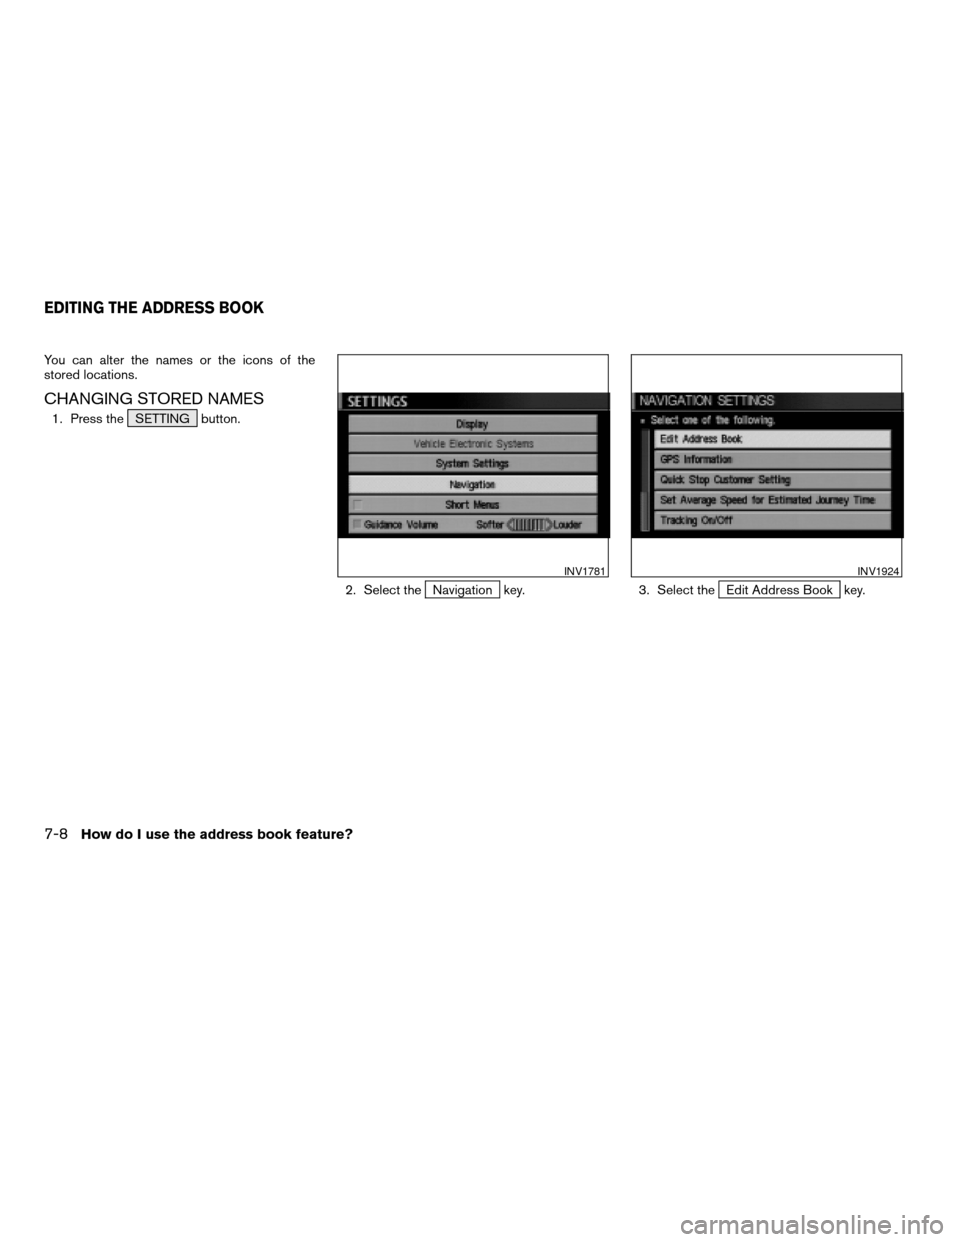 NISSAN MAXIMA 2004 A34 / 6.G Navigation Manual